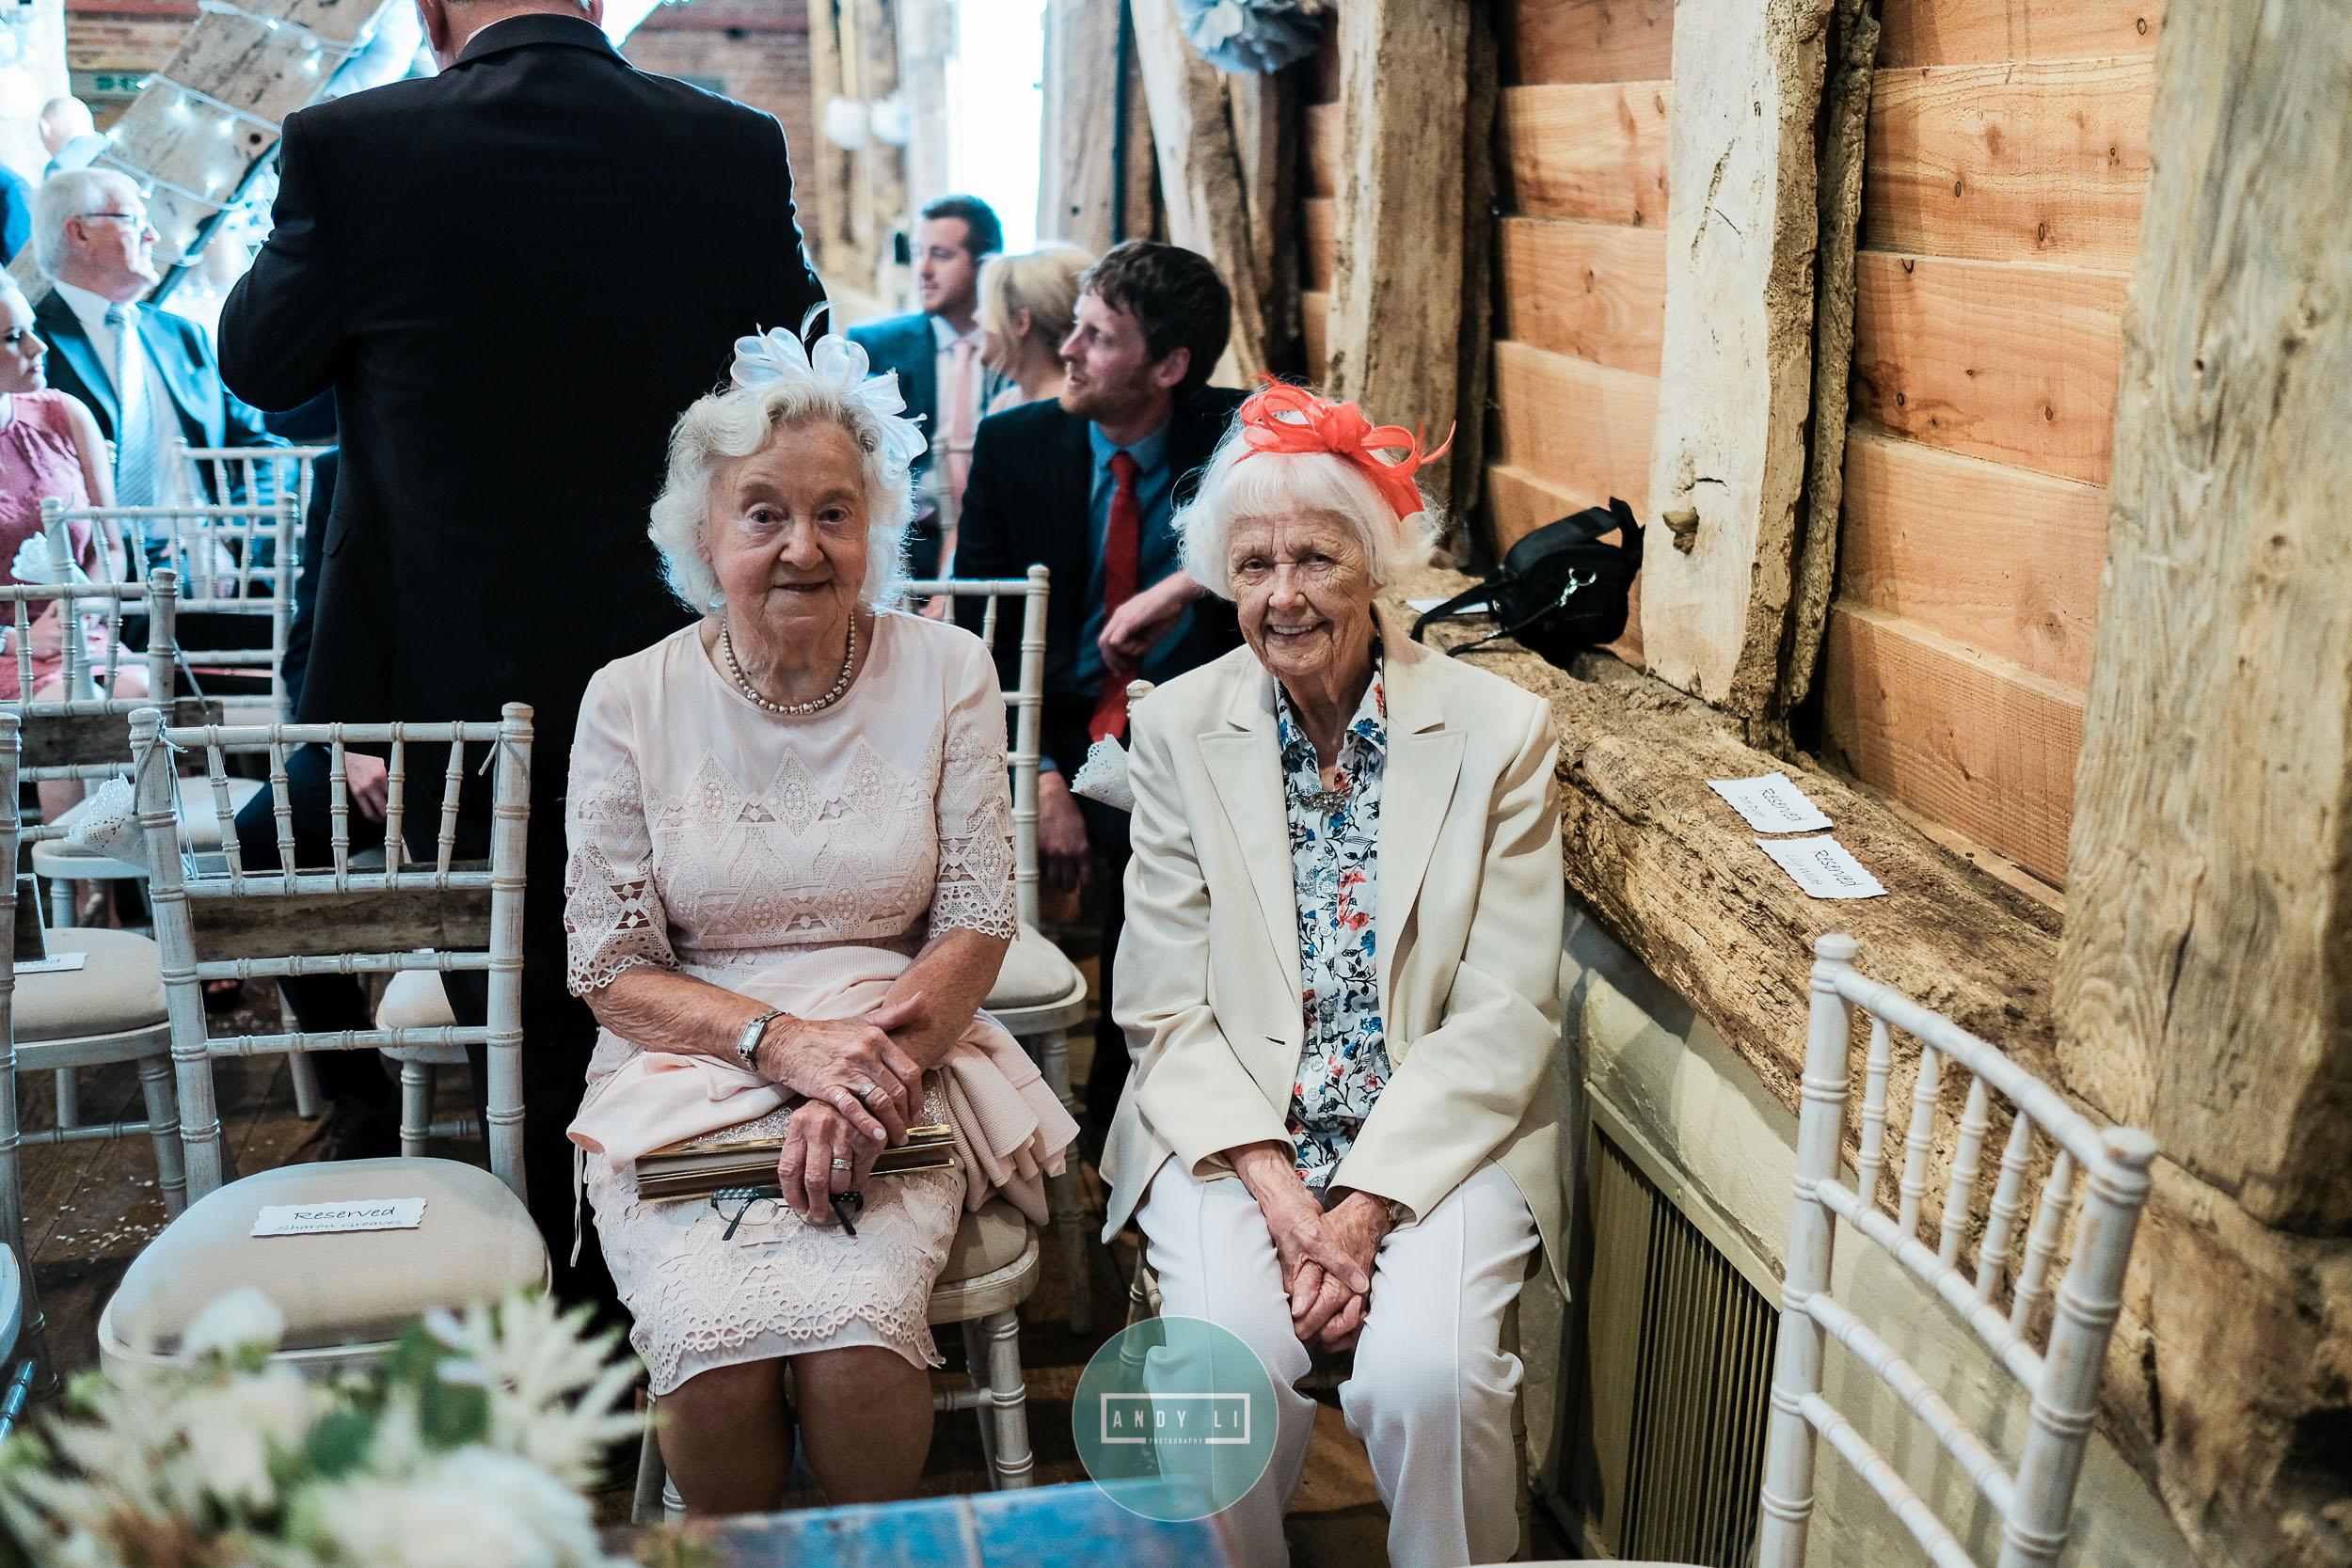 Pimhill Barn Wedding Photographer-043-DSCF0018.jpg